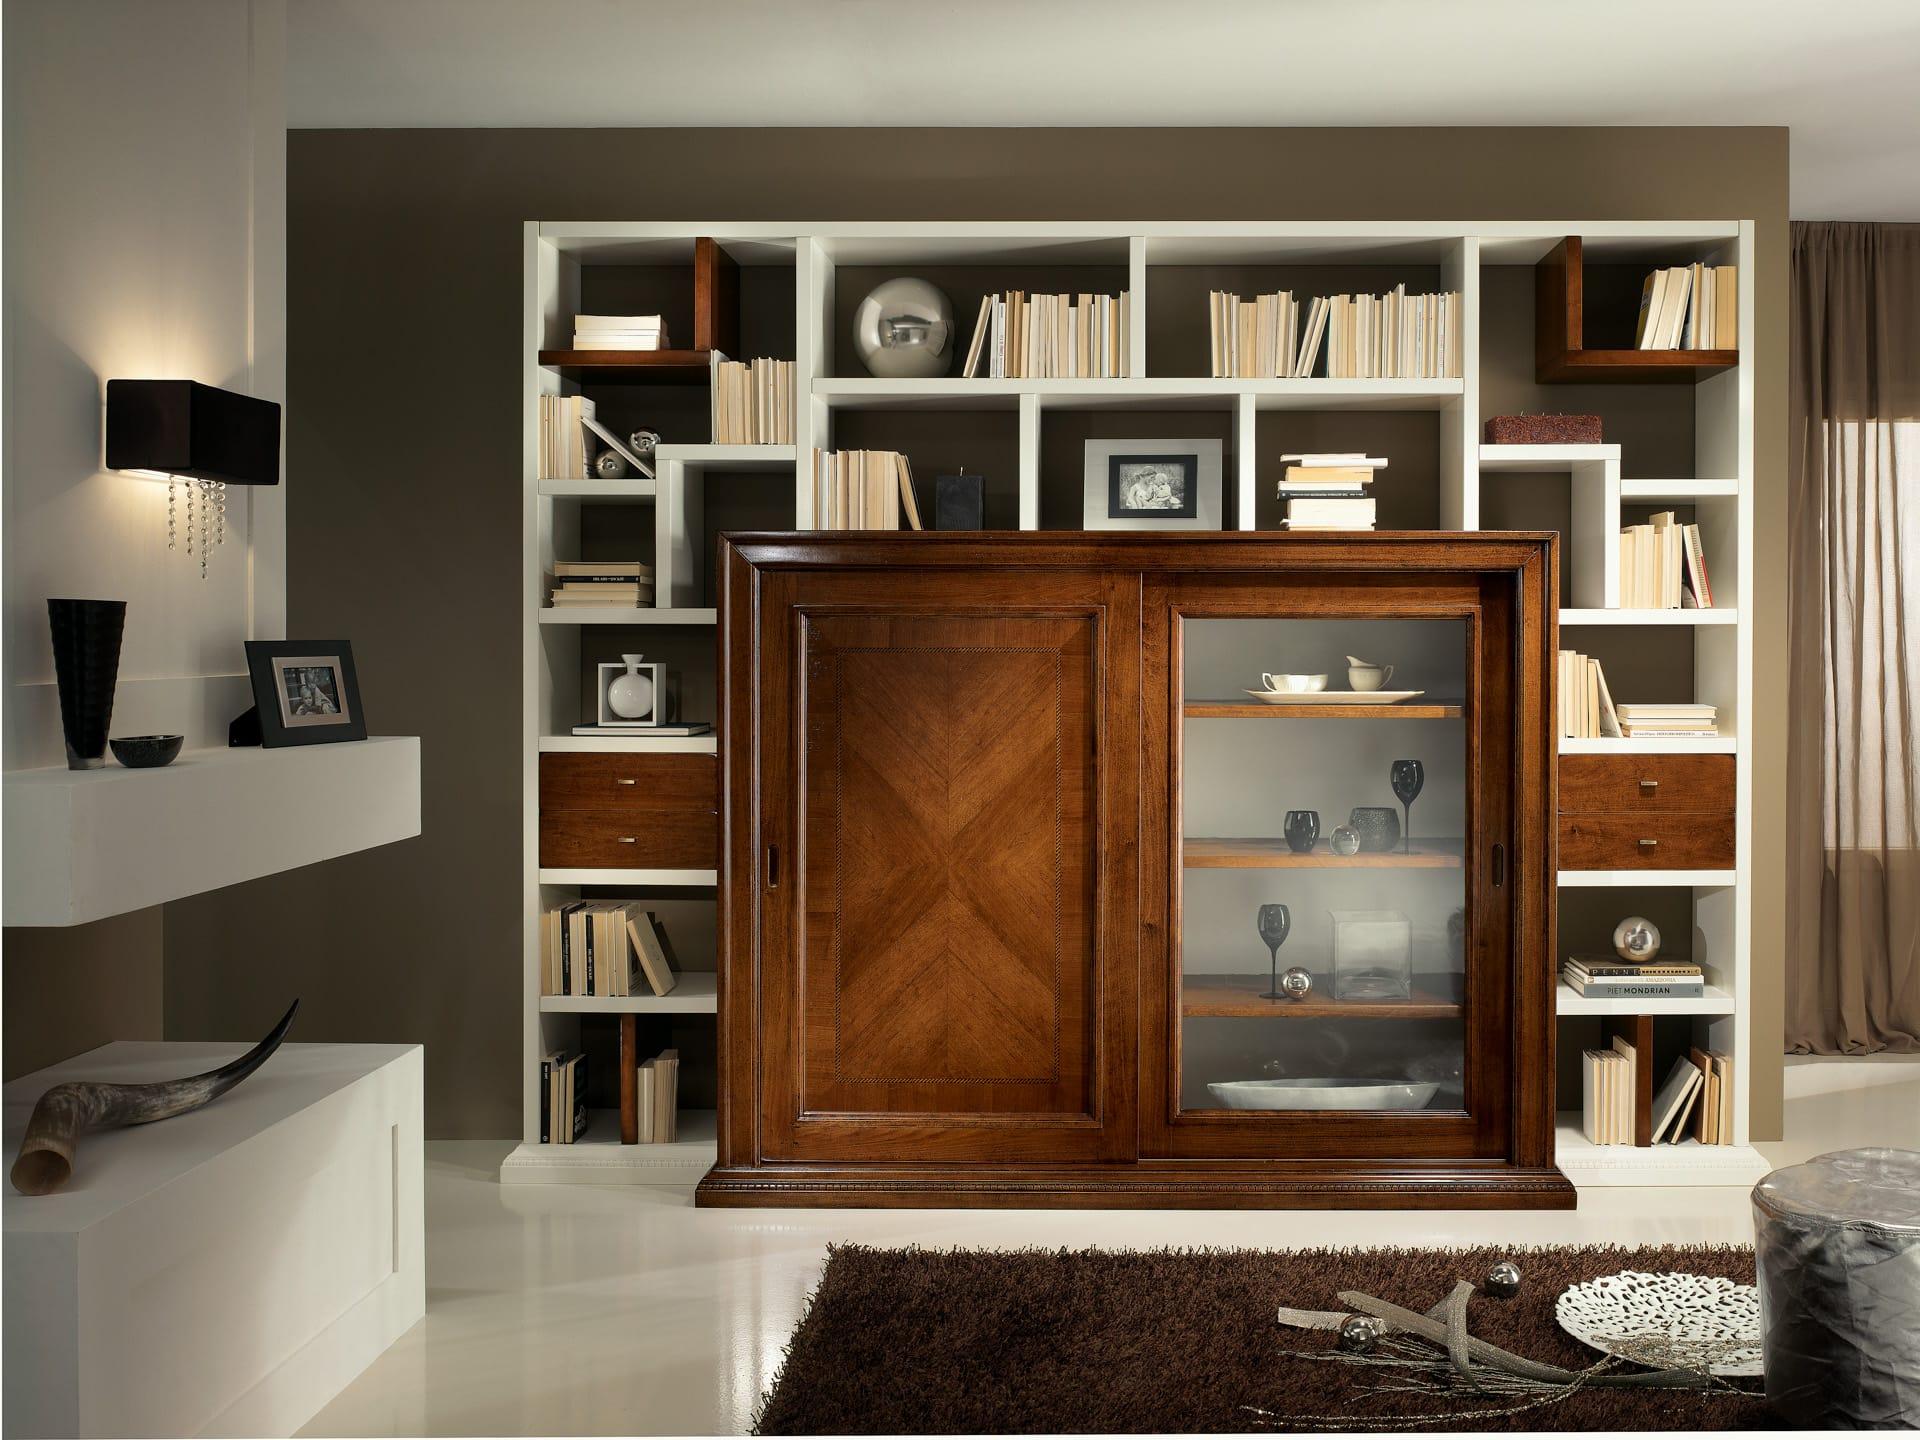 Ducale Trend - Gallery Left 1